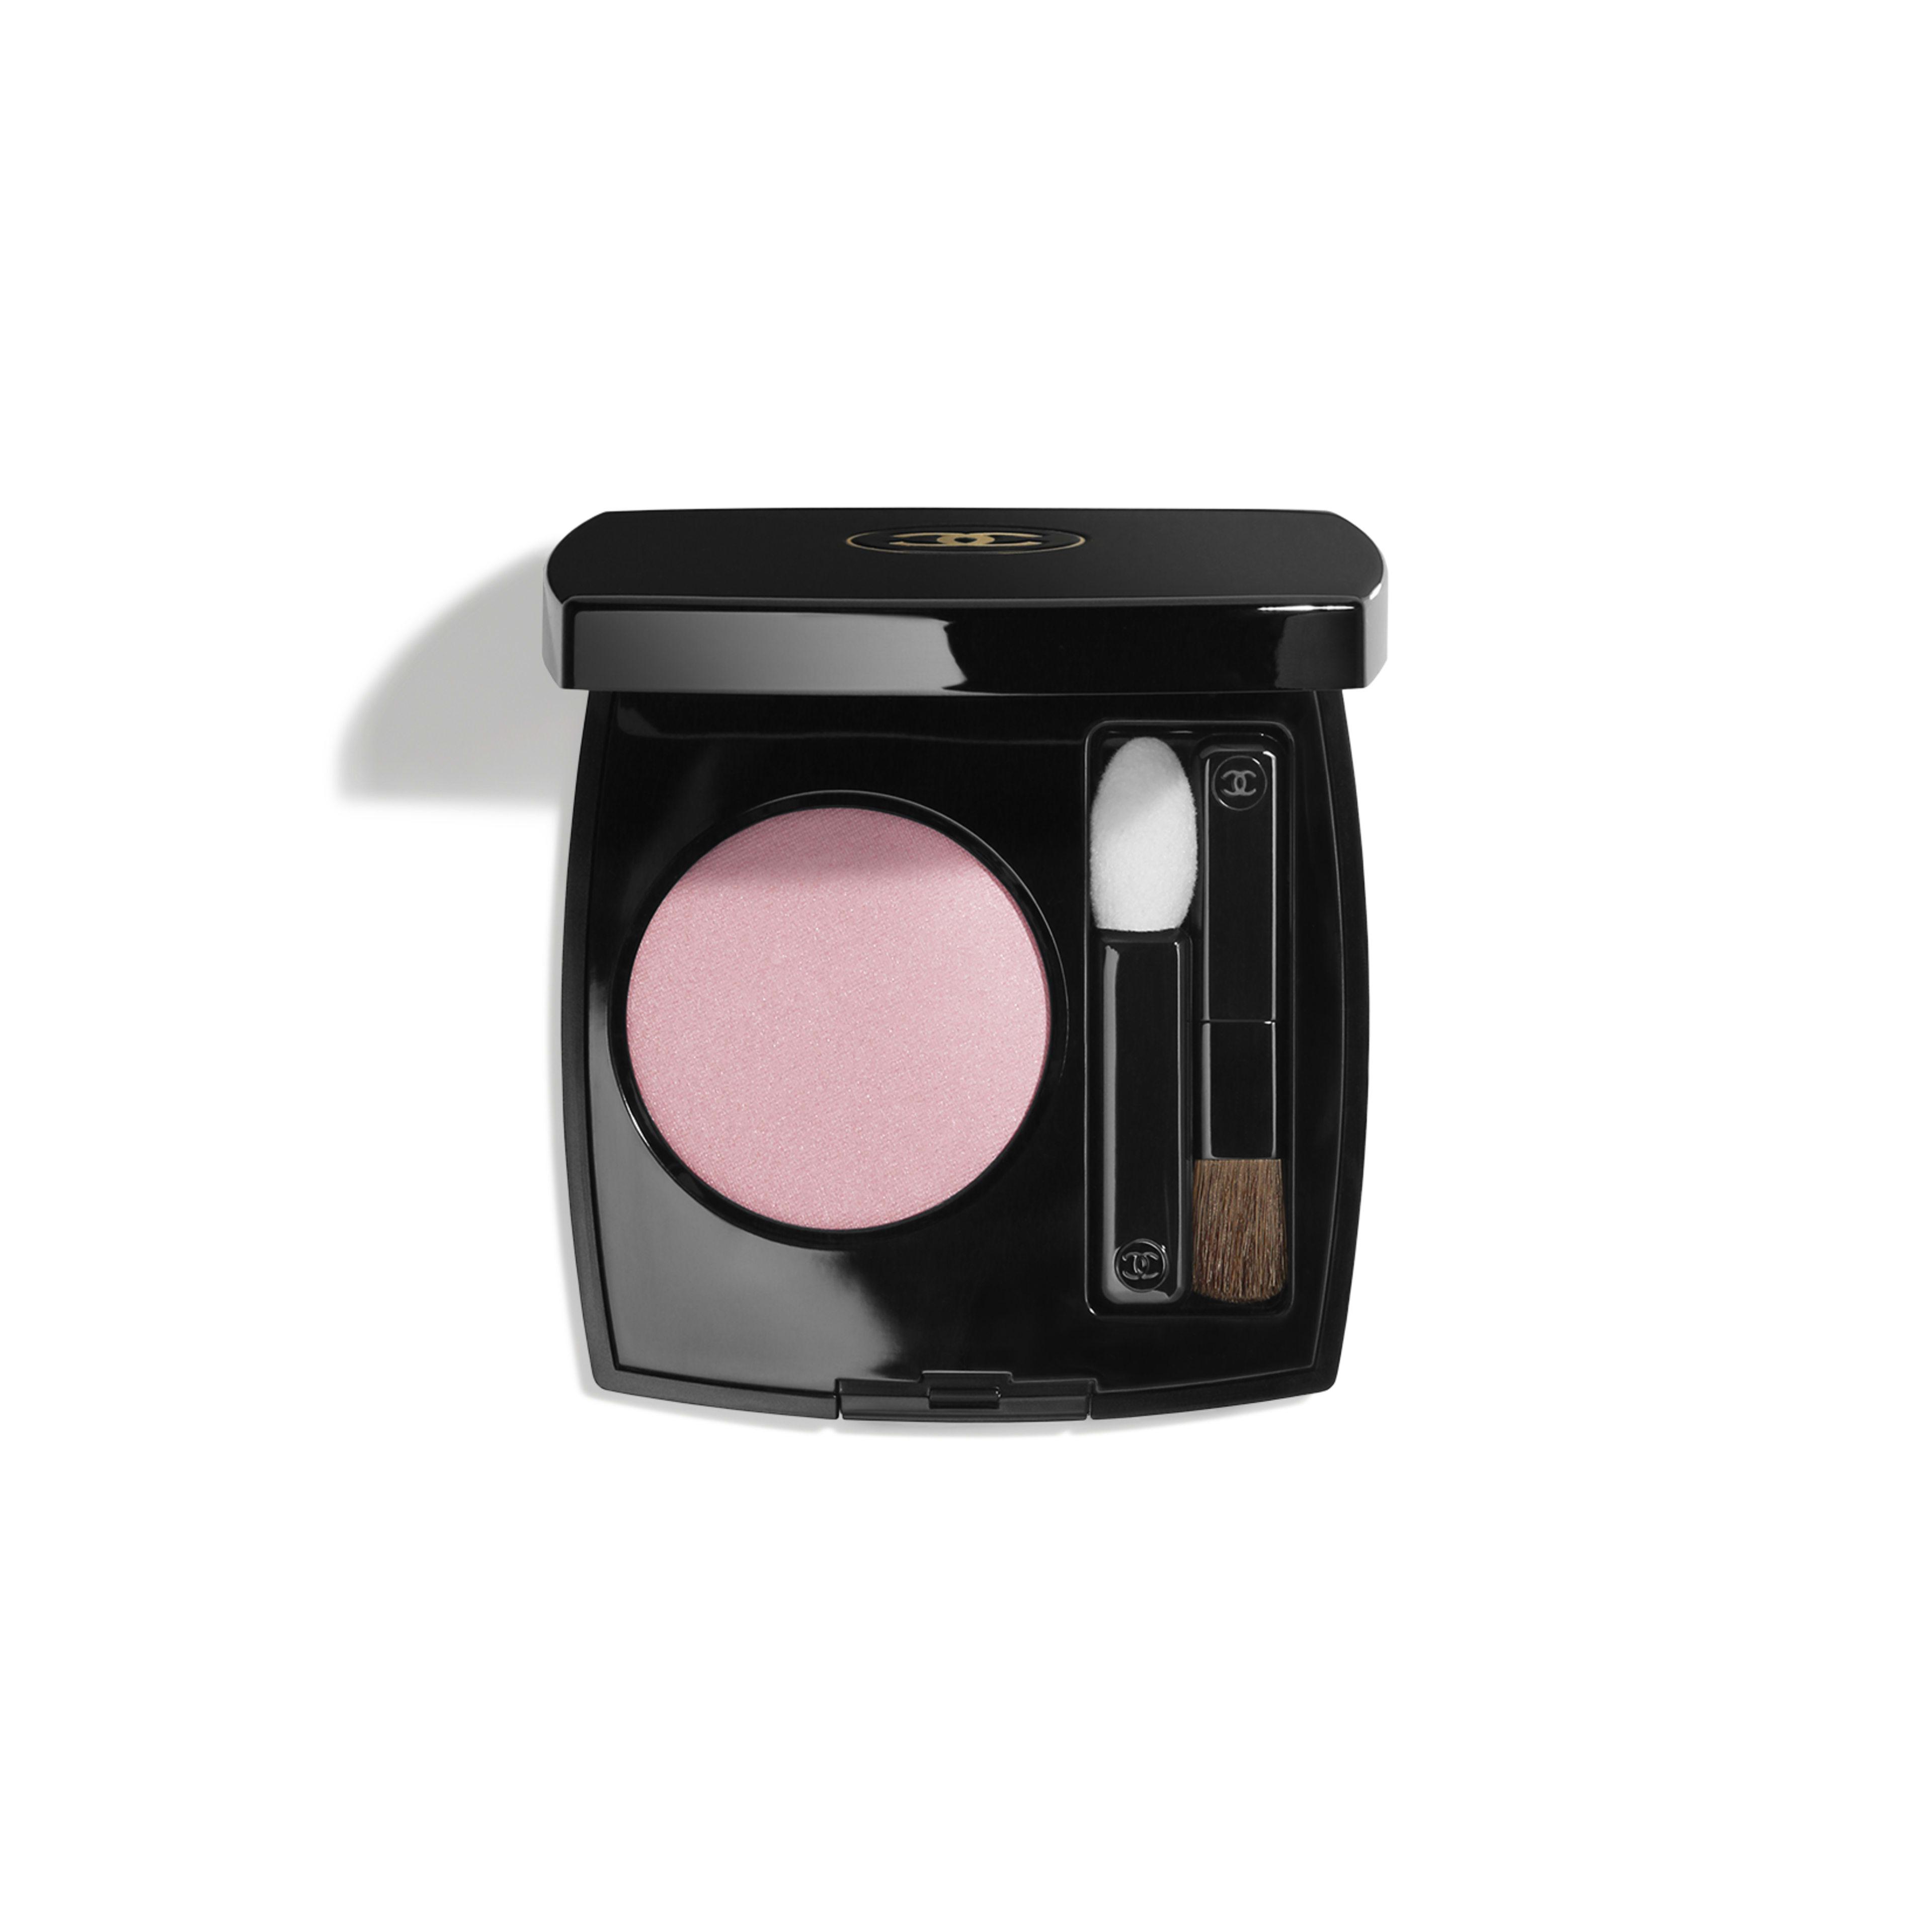 OMBRE PREMIÈRE - makeup - 0.08OZ. -                                                            default view - see full sized version